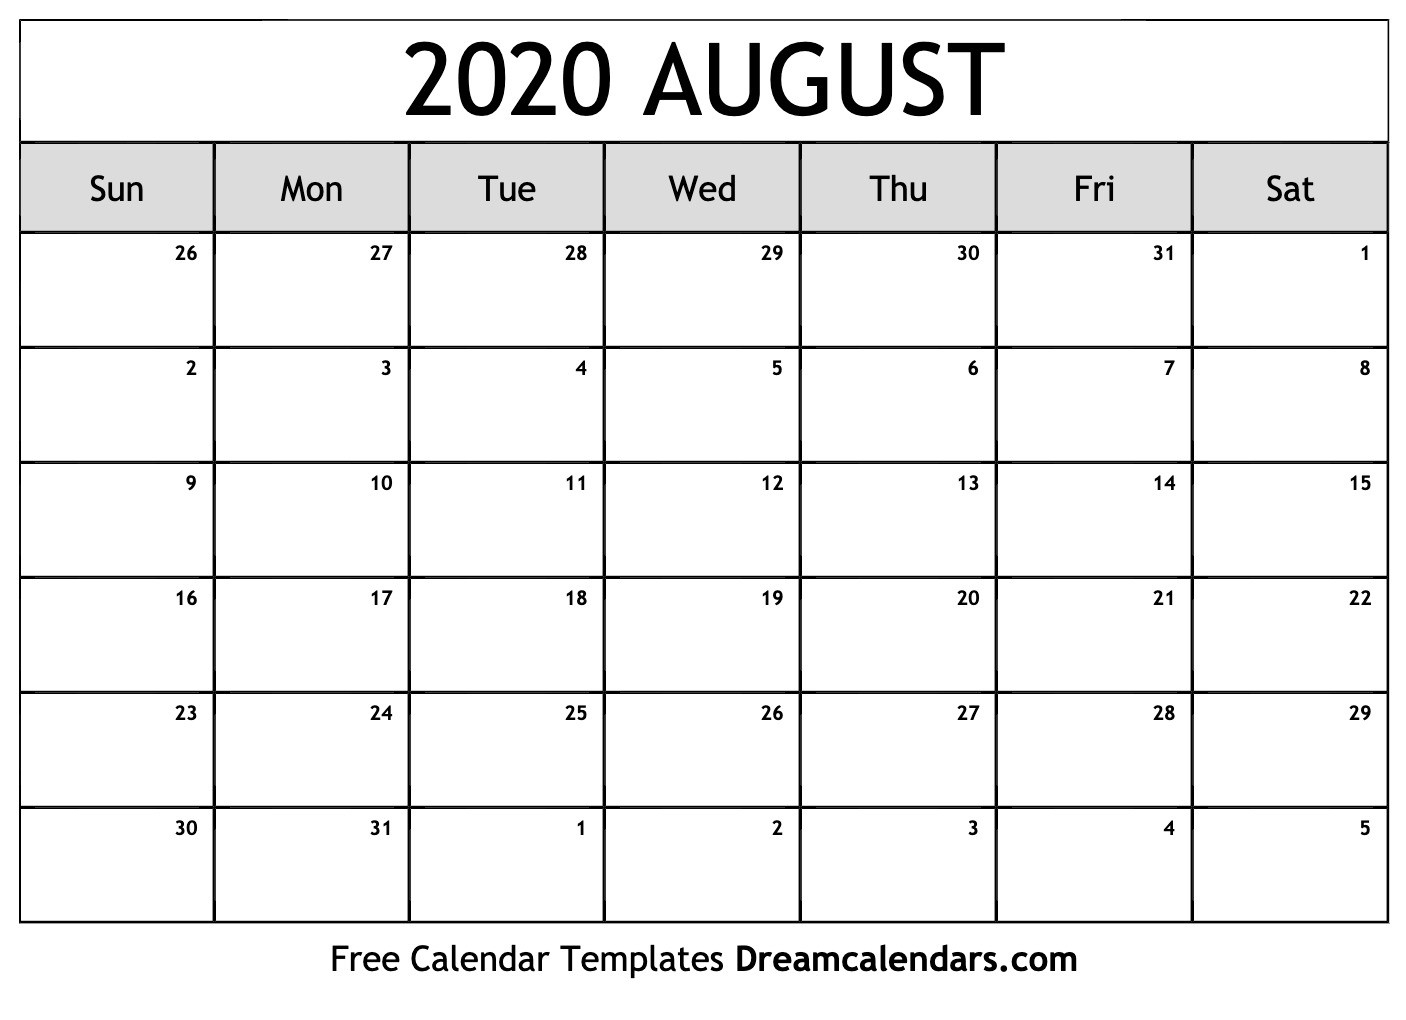 2020 Calendar For August   Calendar Printable Free-Luxe Calendar Aug 2020 Blank Printable